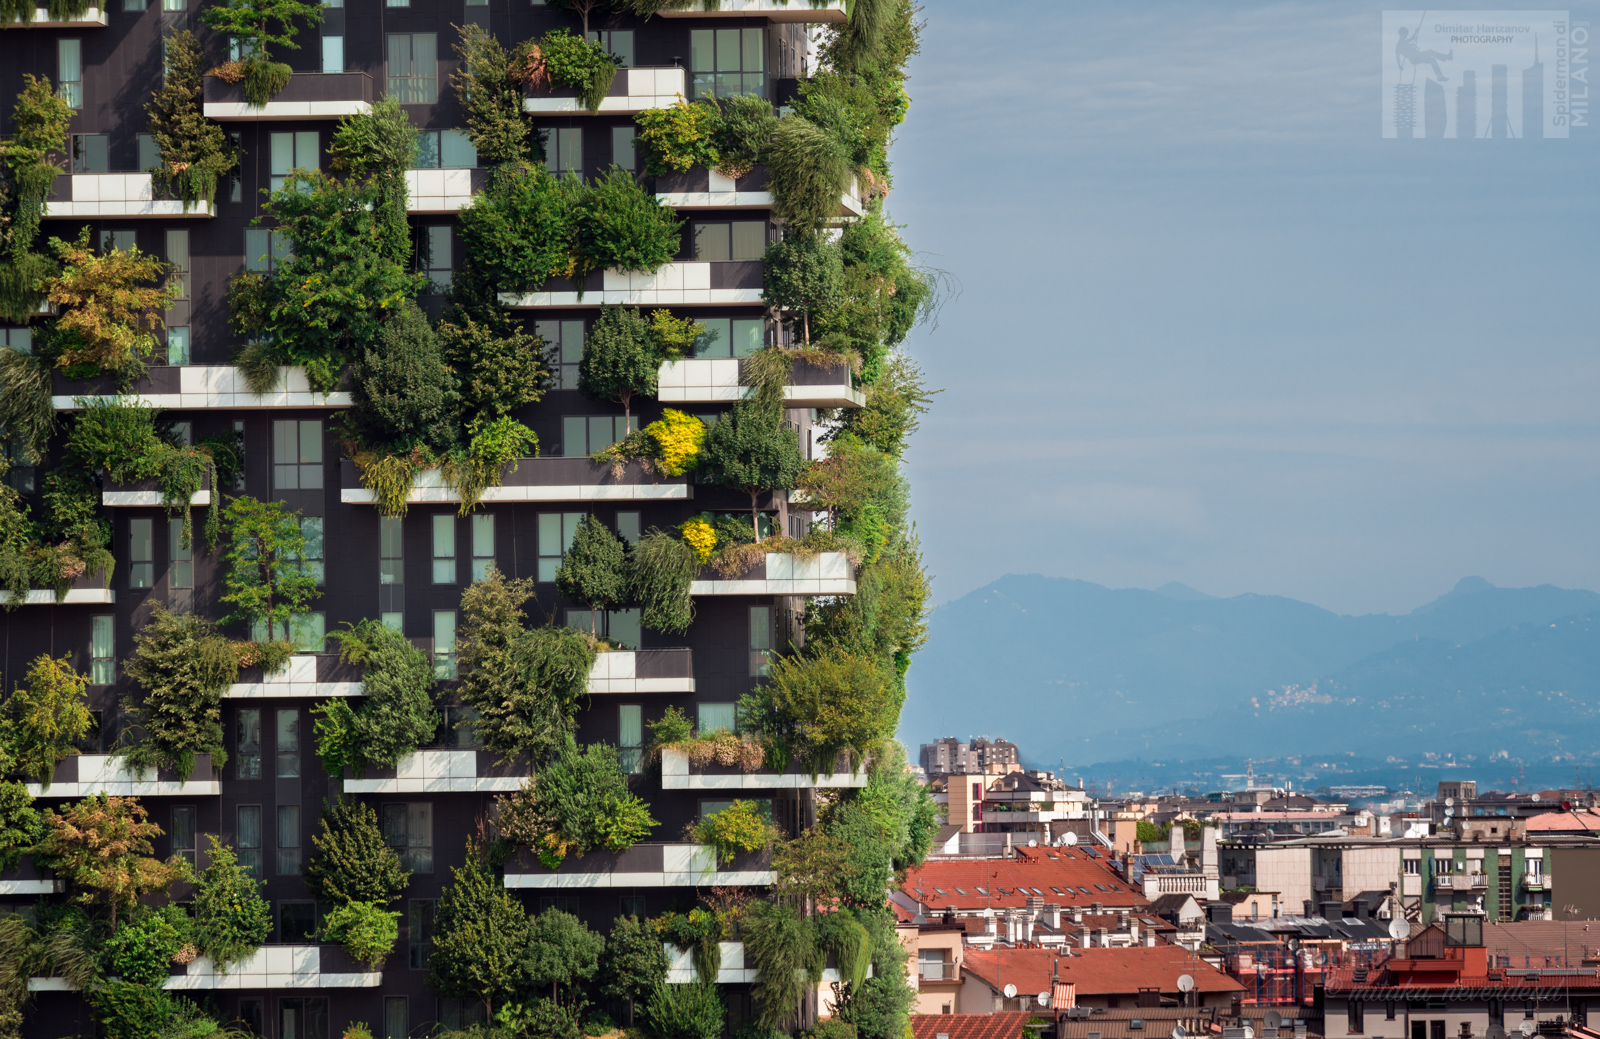 Milan bosco verticale 116m 27 fl 85m 19 fl com for Giardino verticale